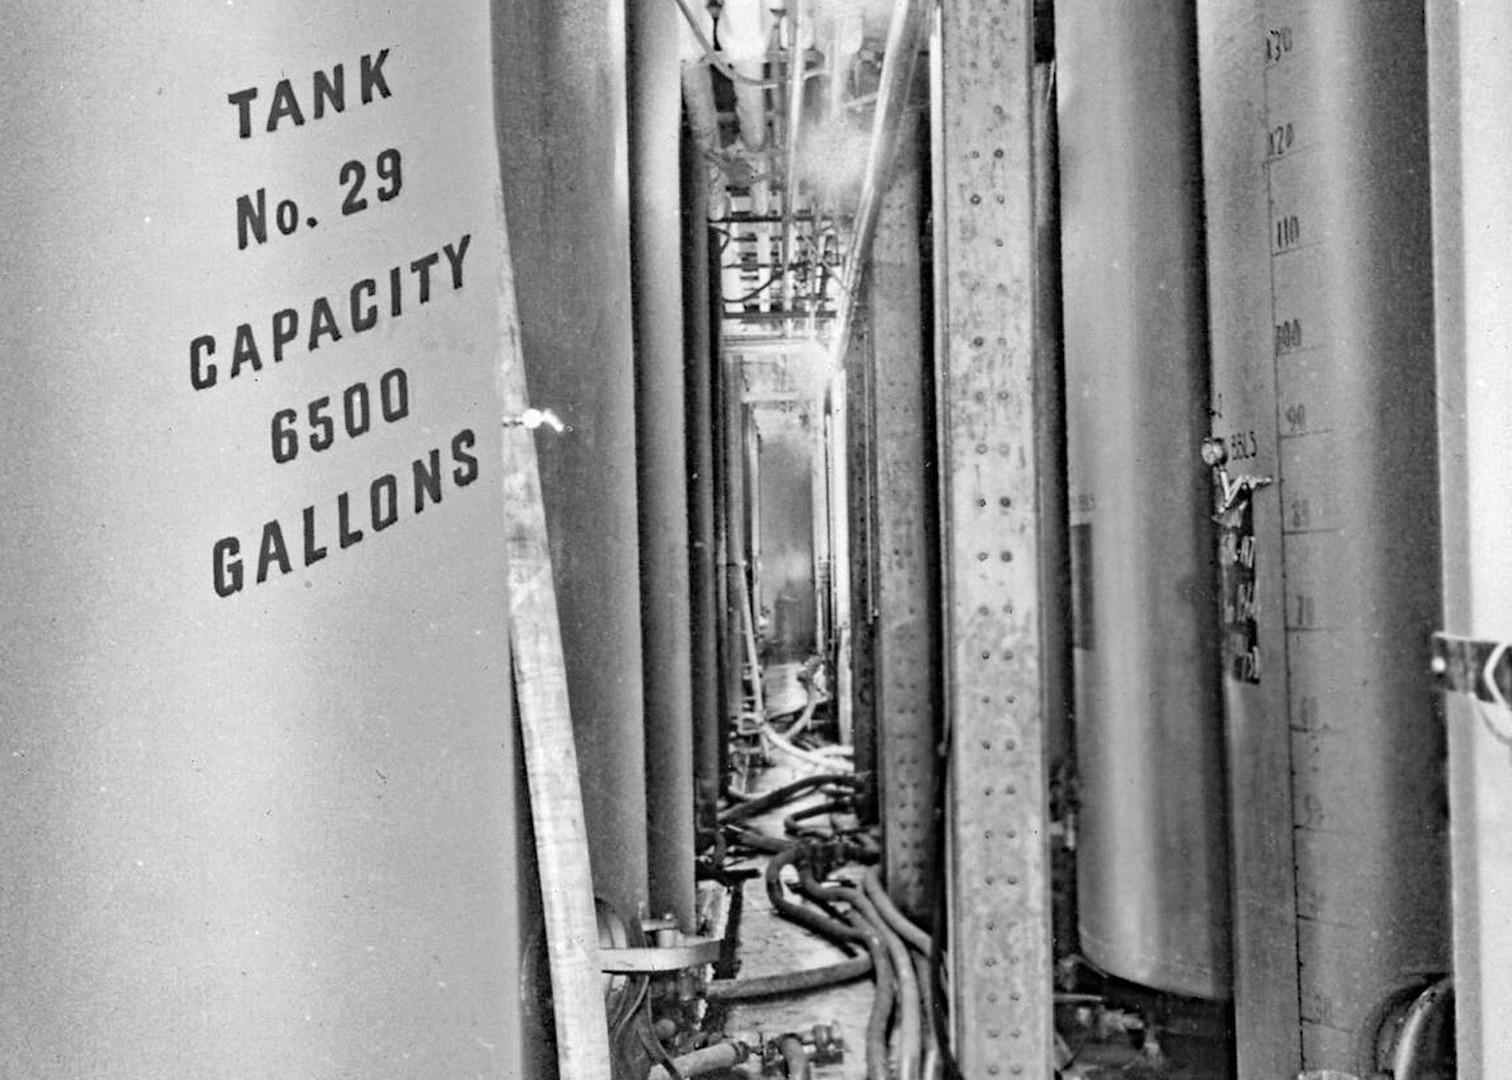 Storage Celler, Bavarian Brewing Co., Covington, KY.